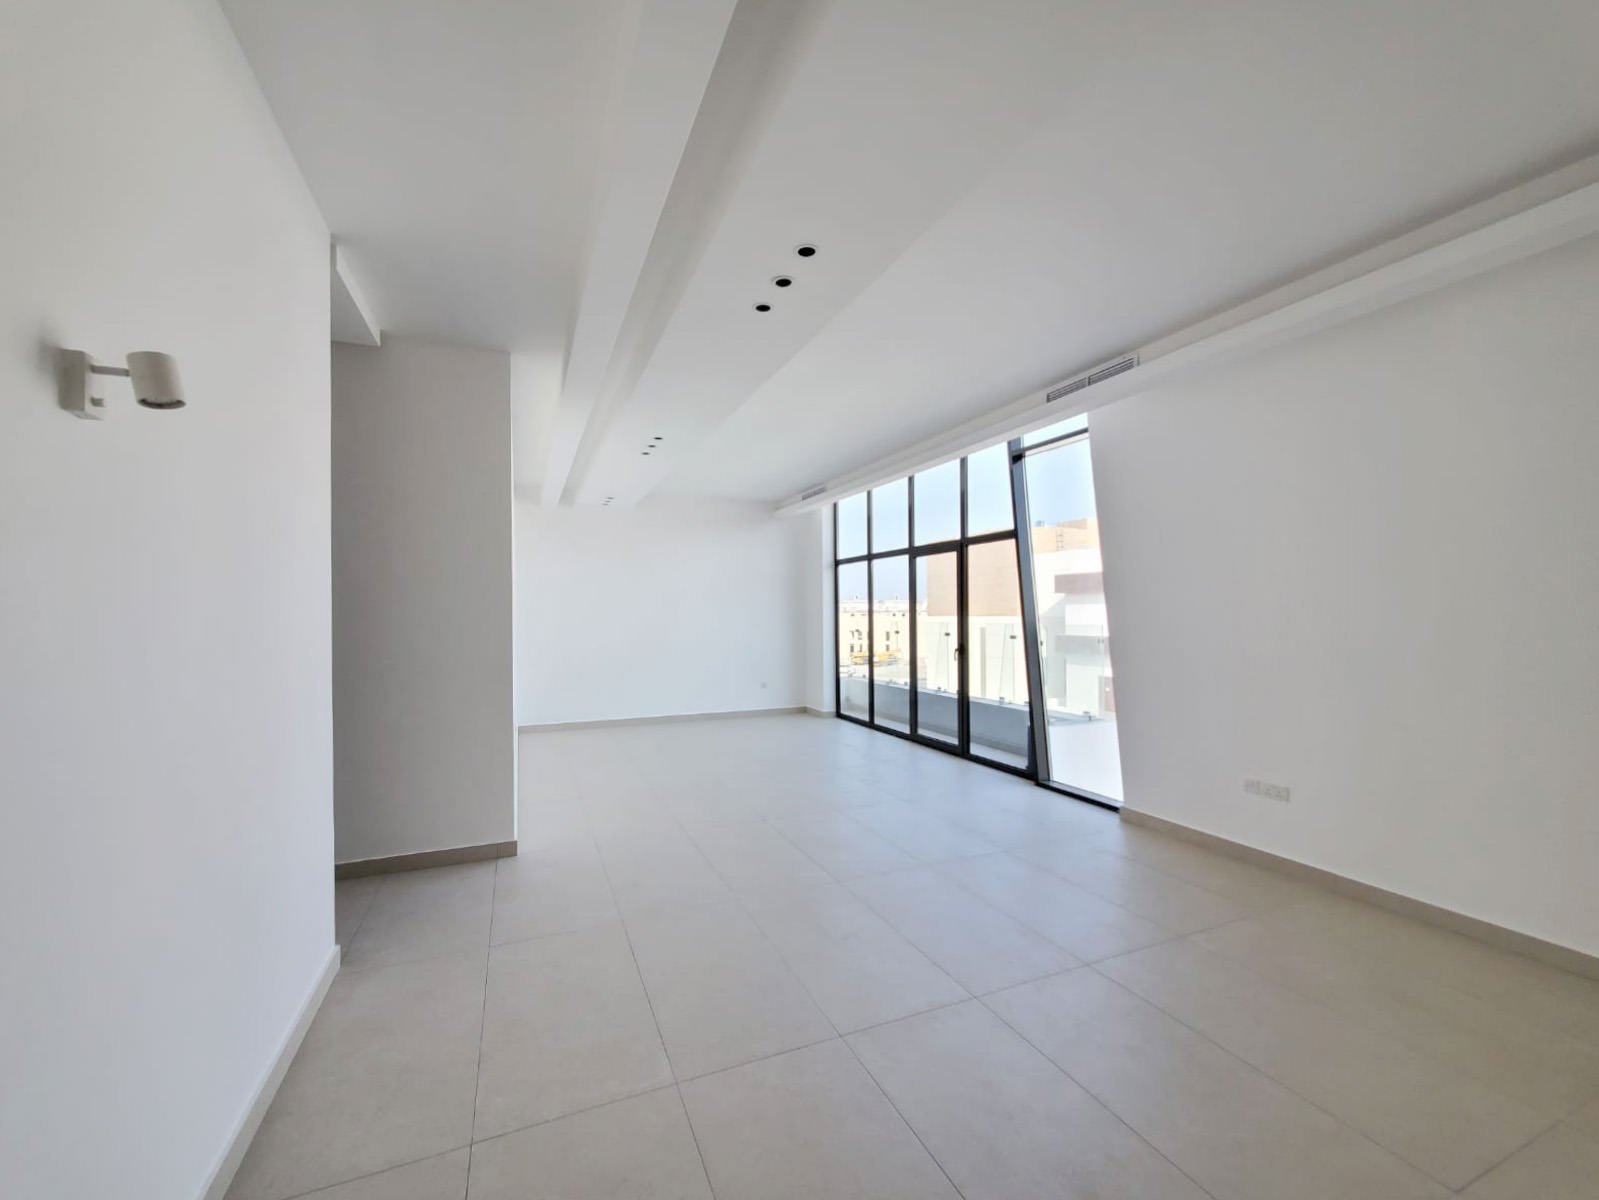 Masayel – new, unfurnished three bedroom apartments